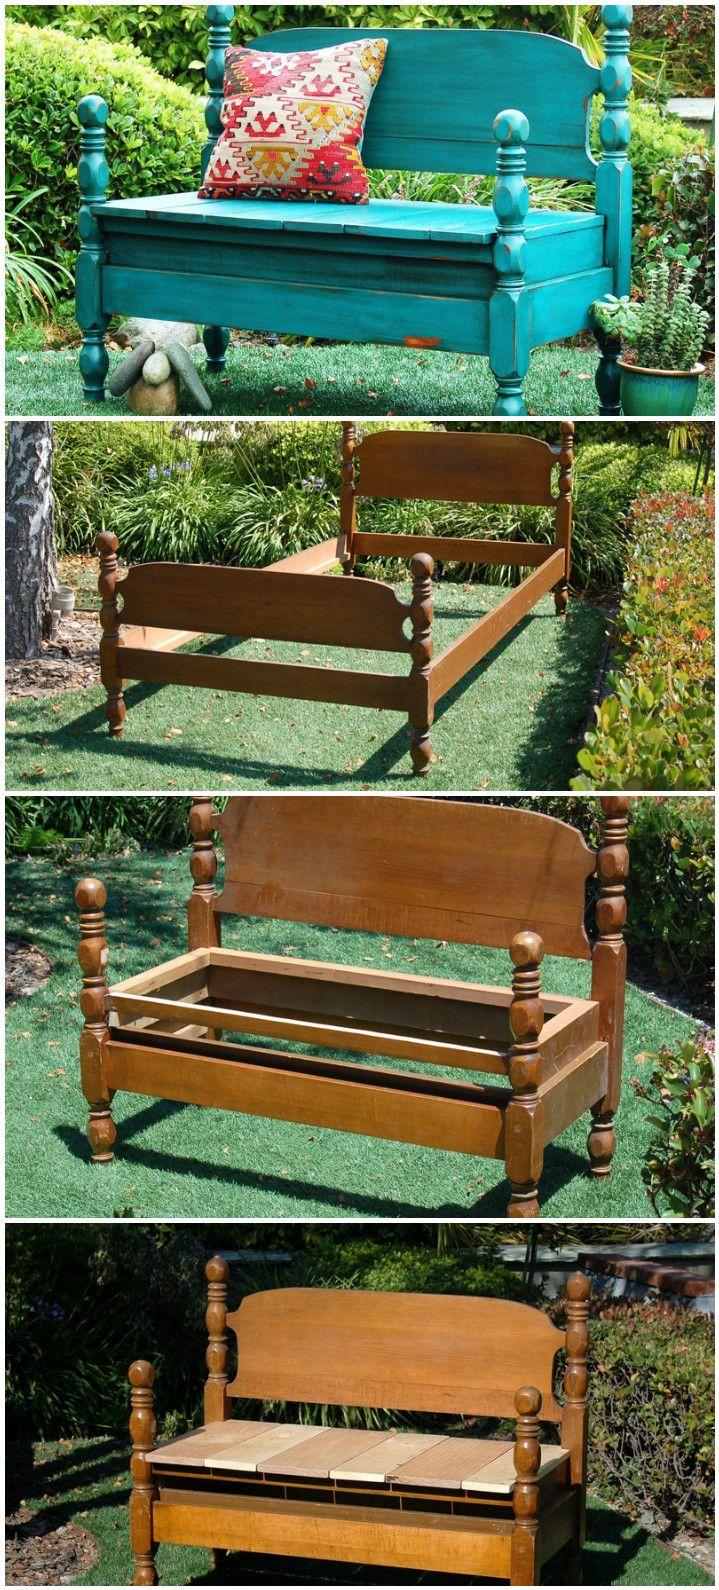 old vintage bed frame into cool garden bench